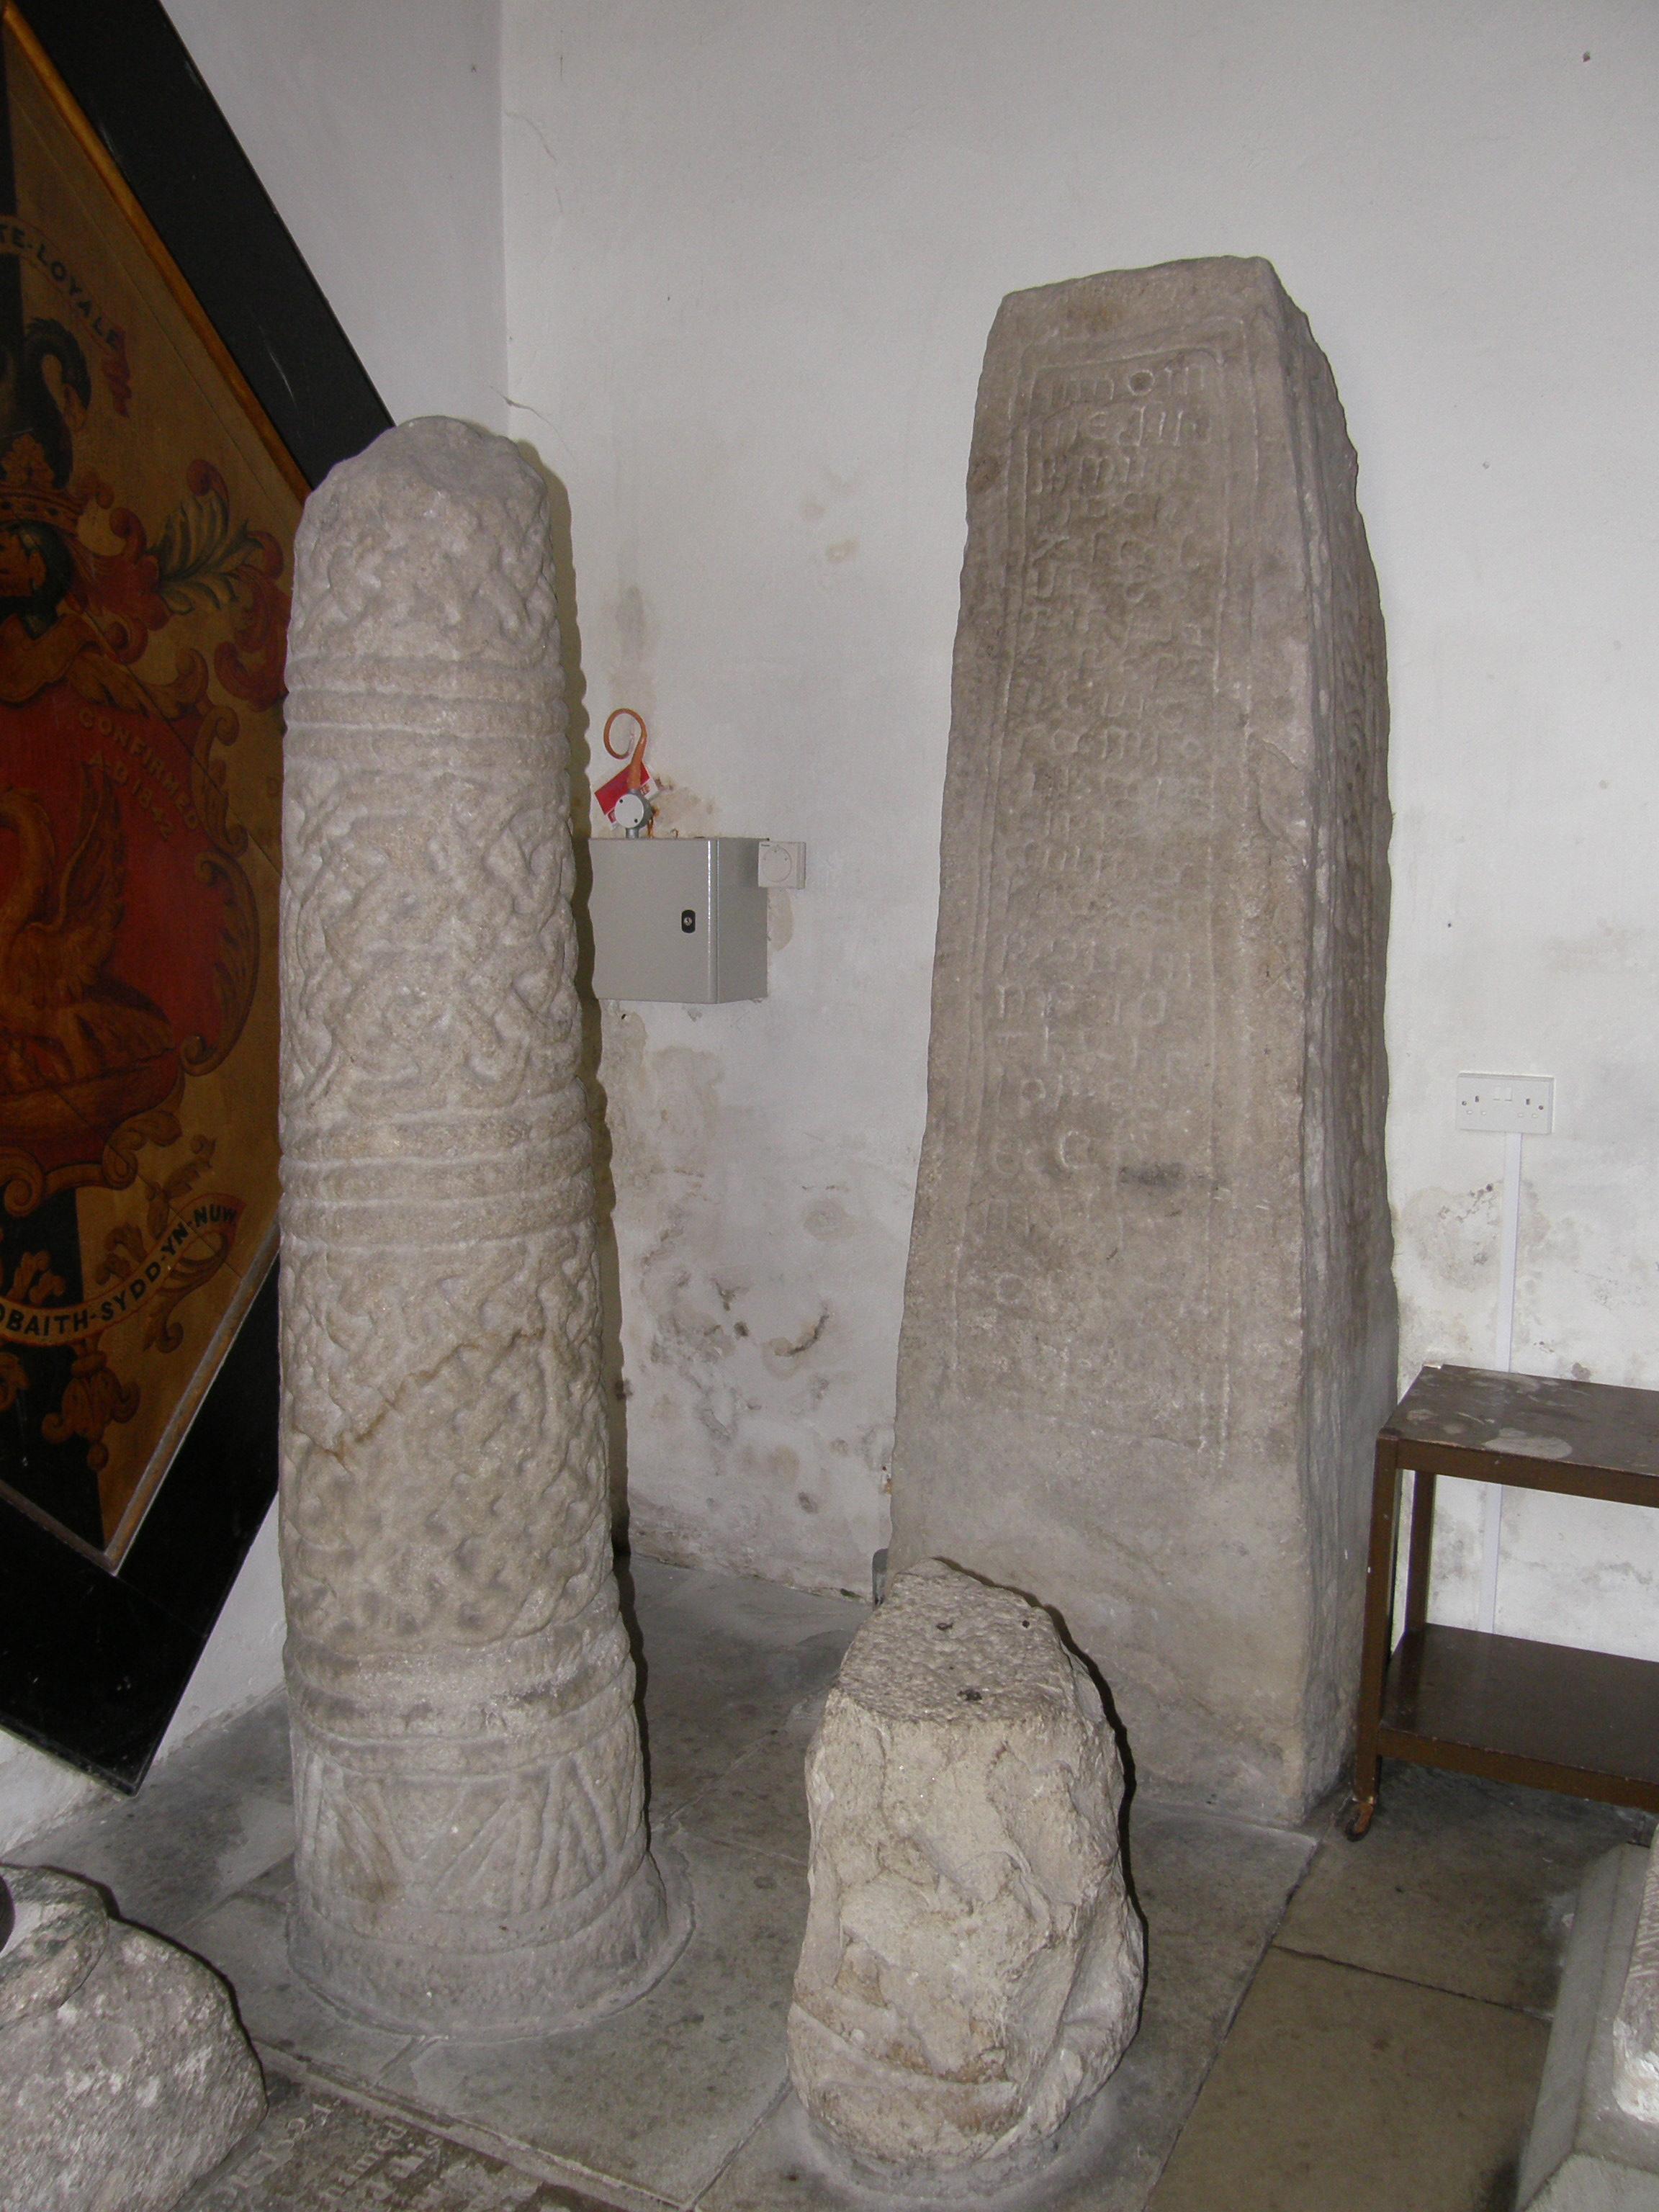 St. Illtuds, Celtic carved stones